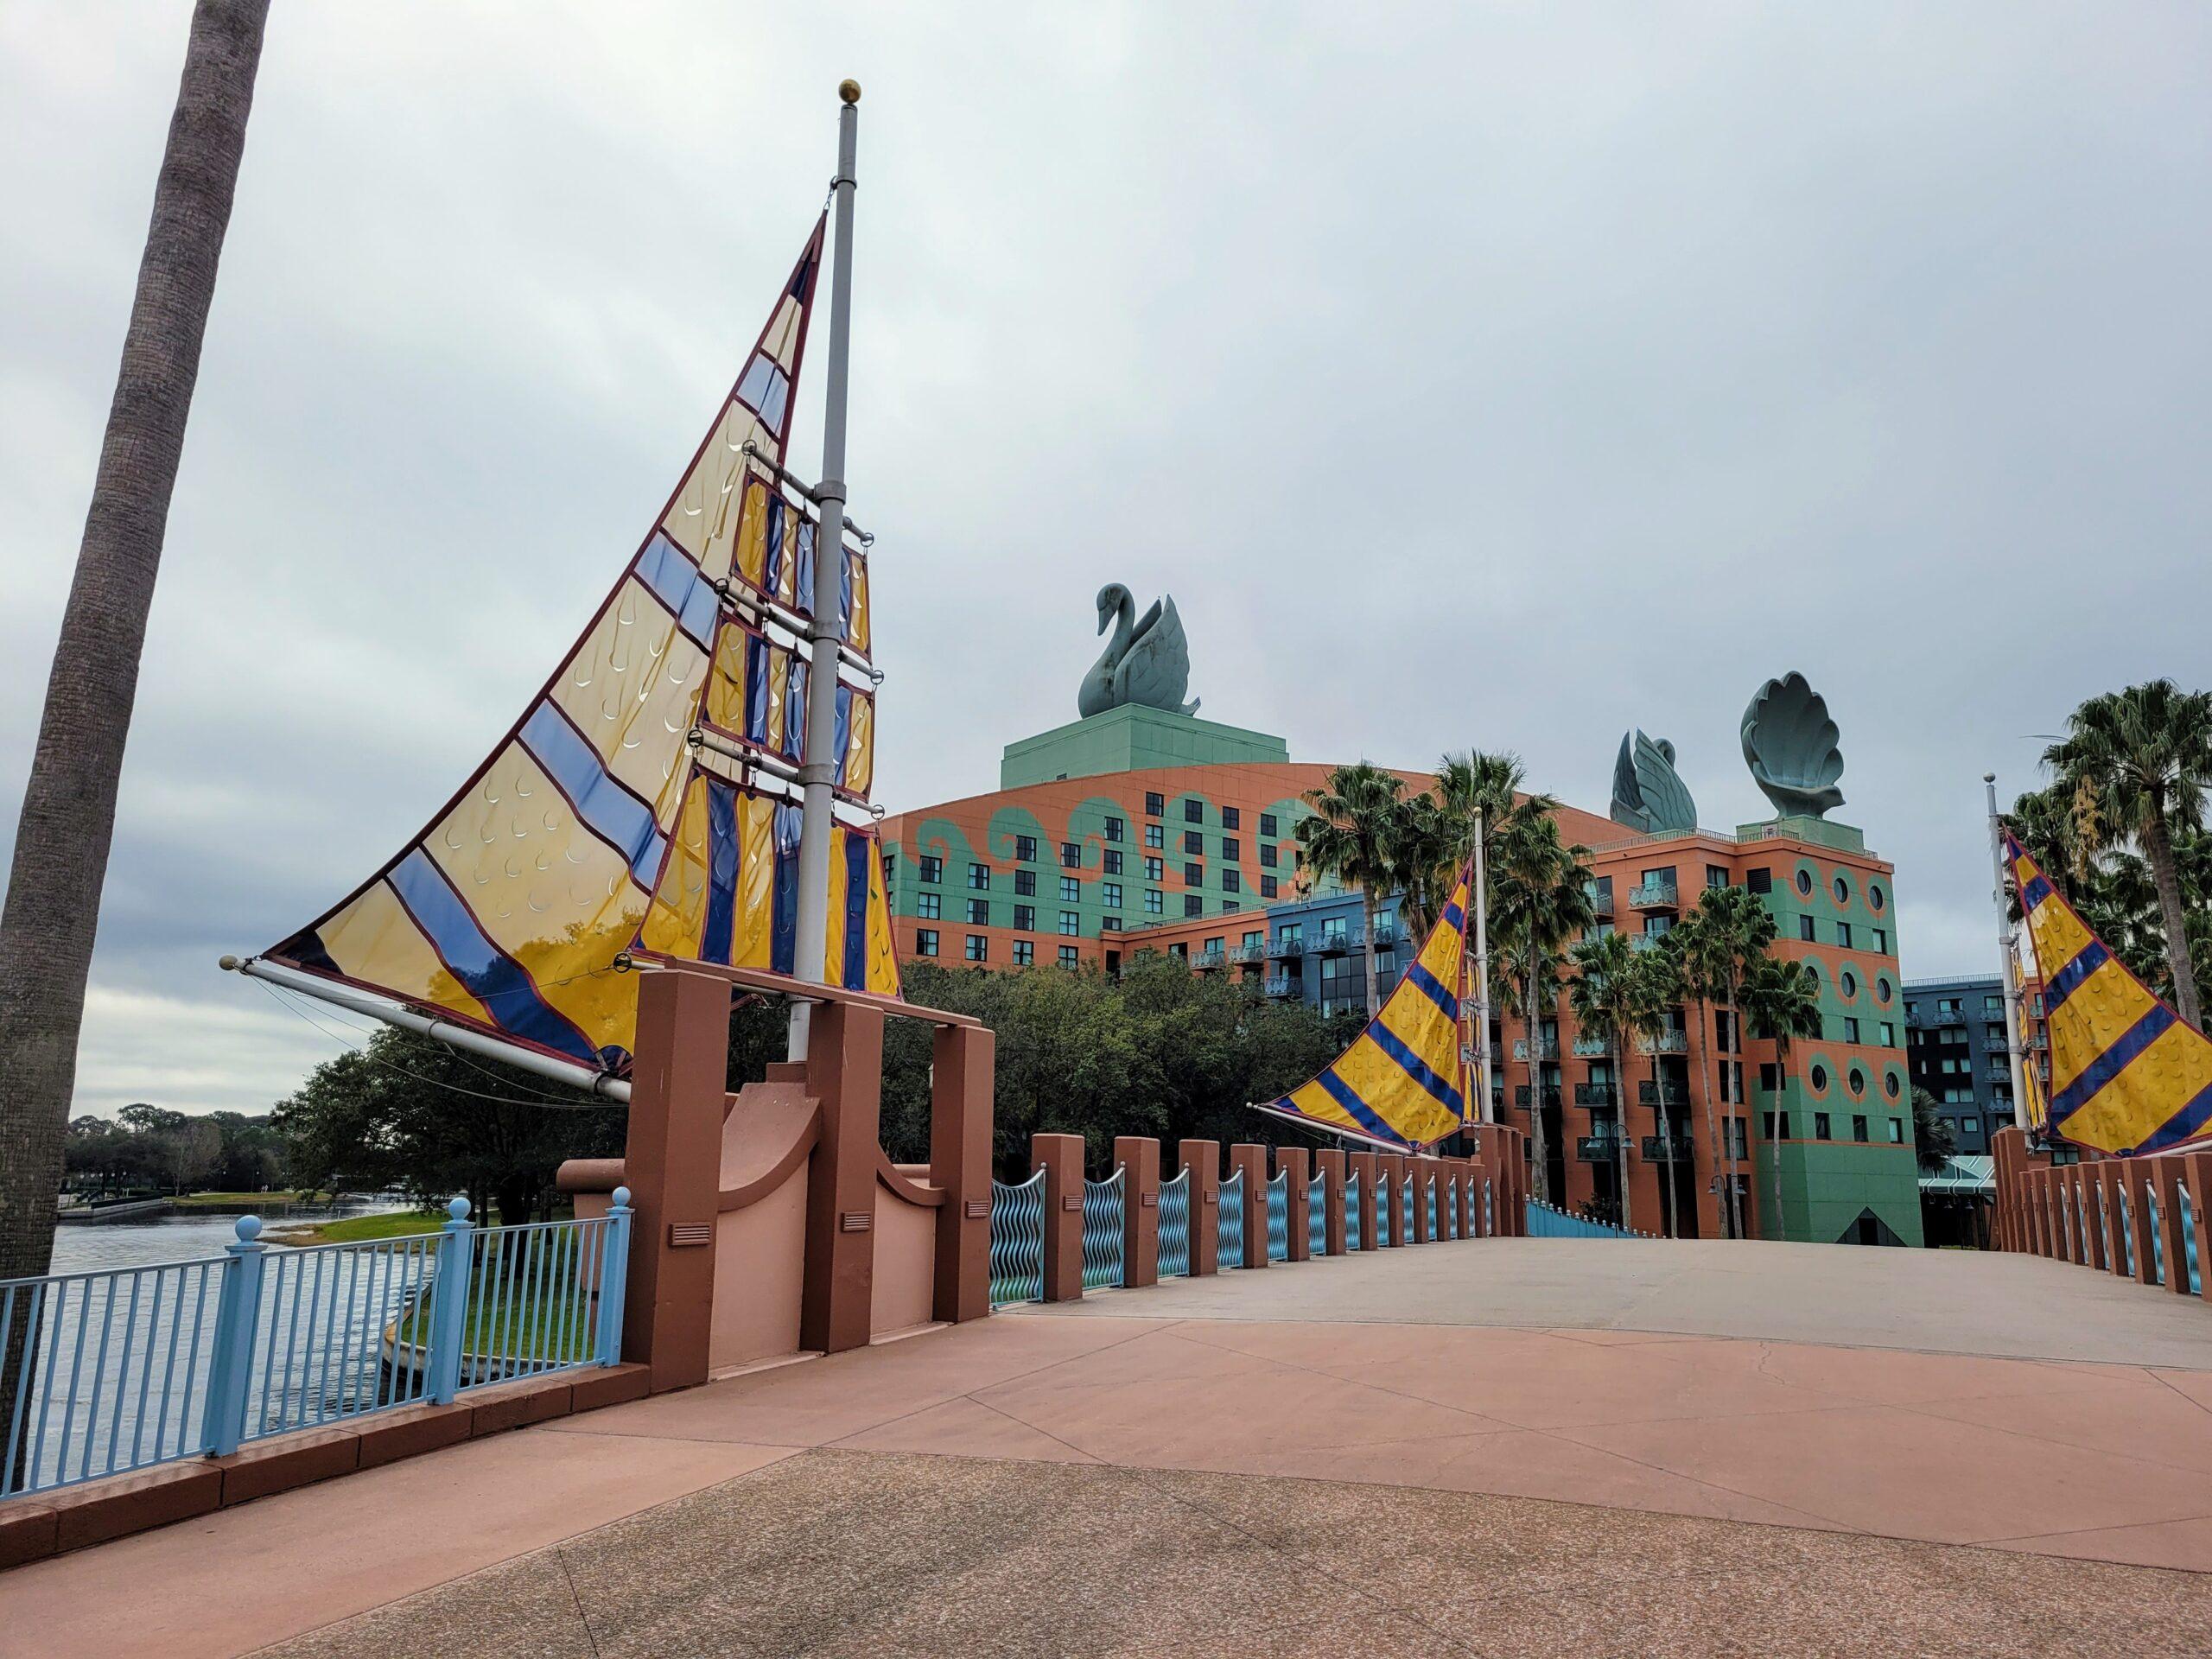 Walt Disney World Swan Hotel - Near the Boardwalk